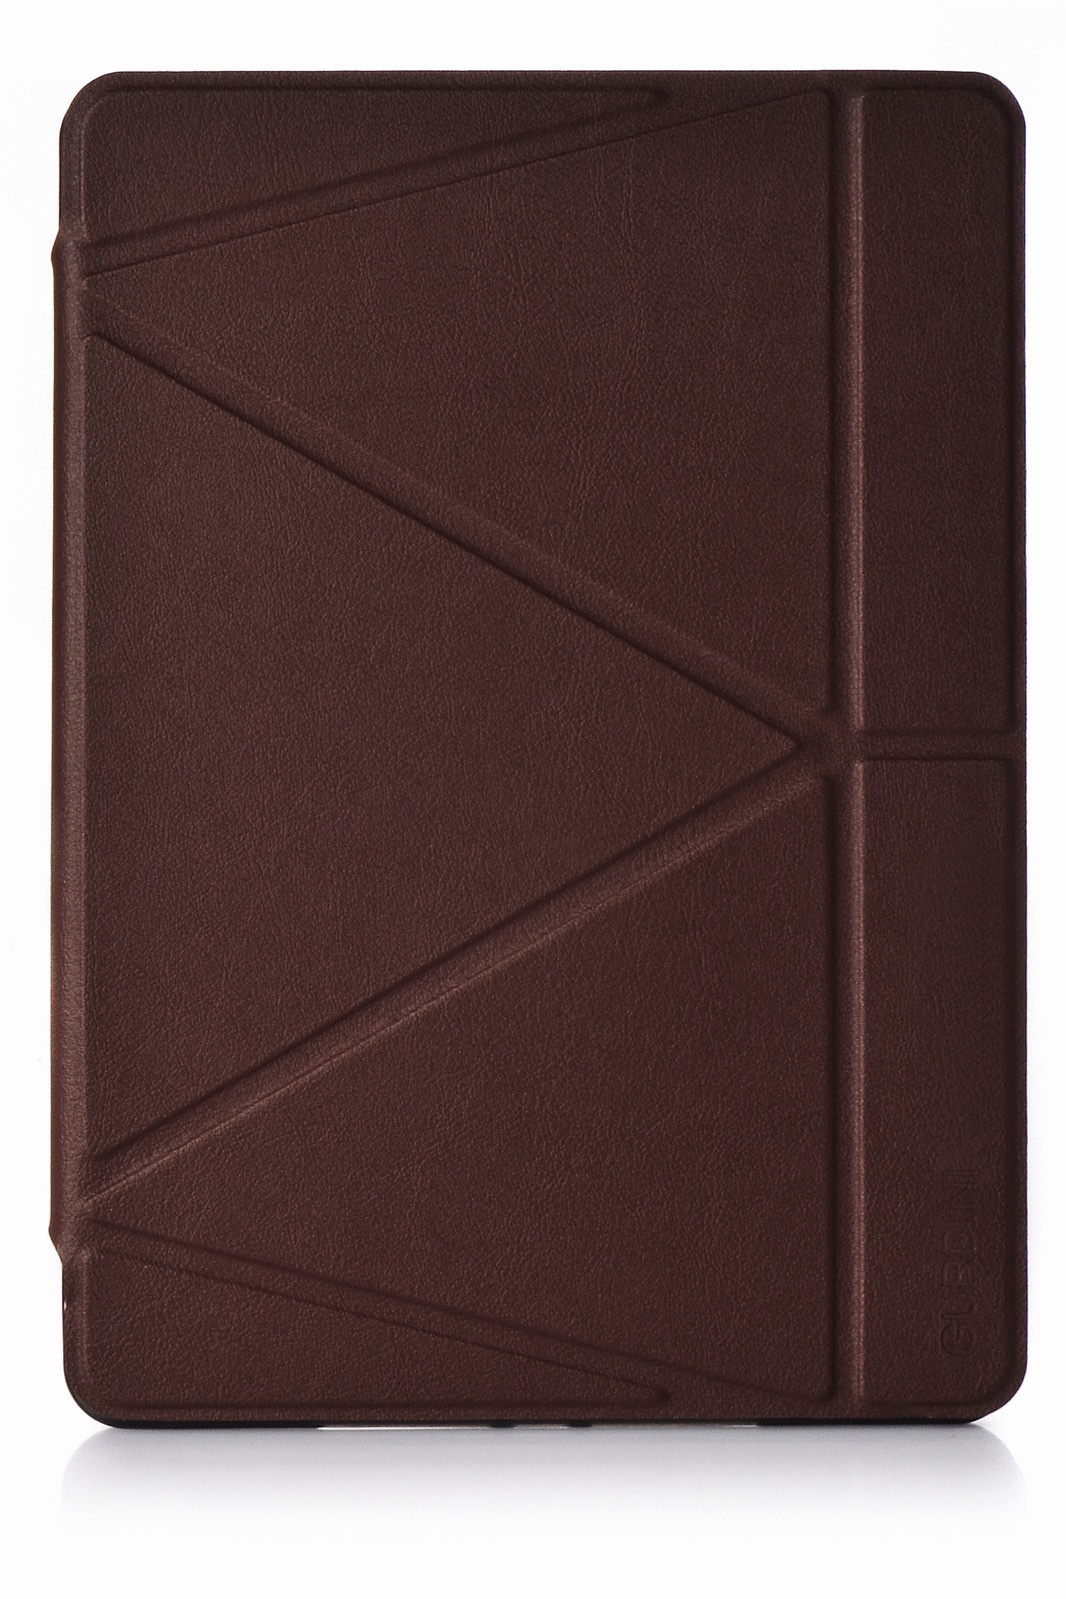 Чехол для планшета Gurdini Lights Series для Apple iPad Air 2, 660029, коричневый